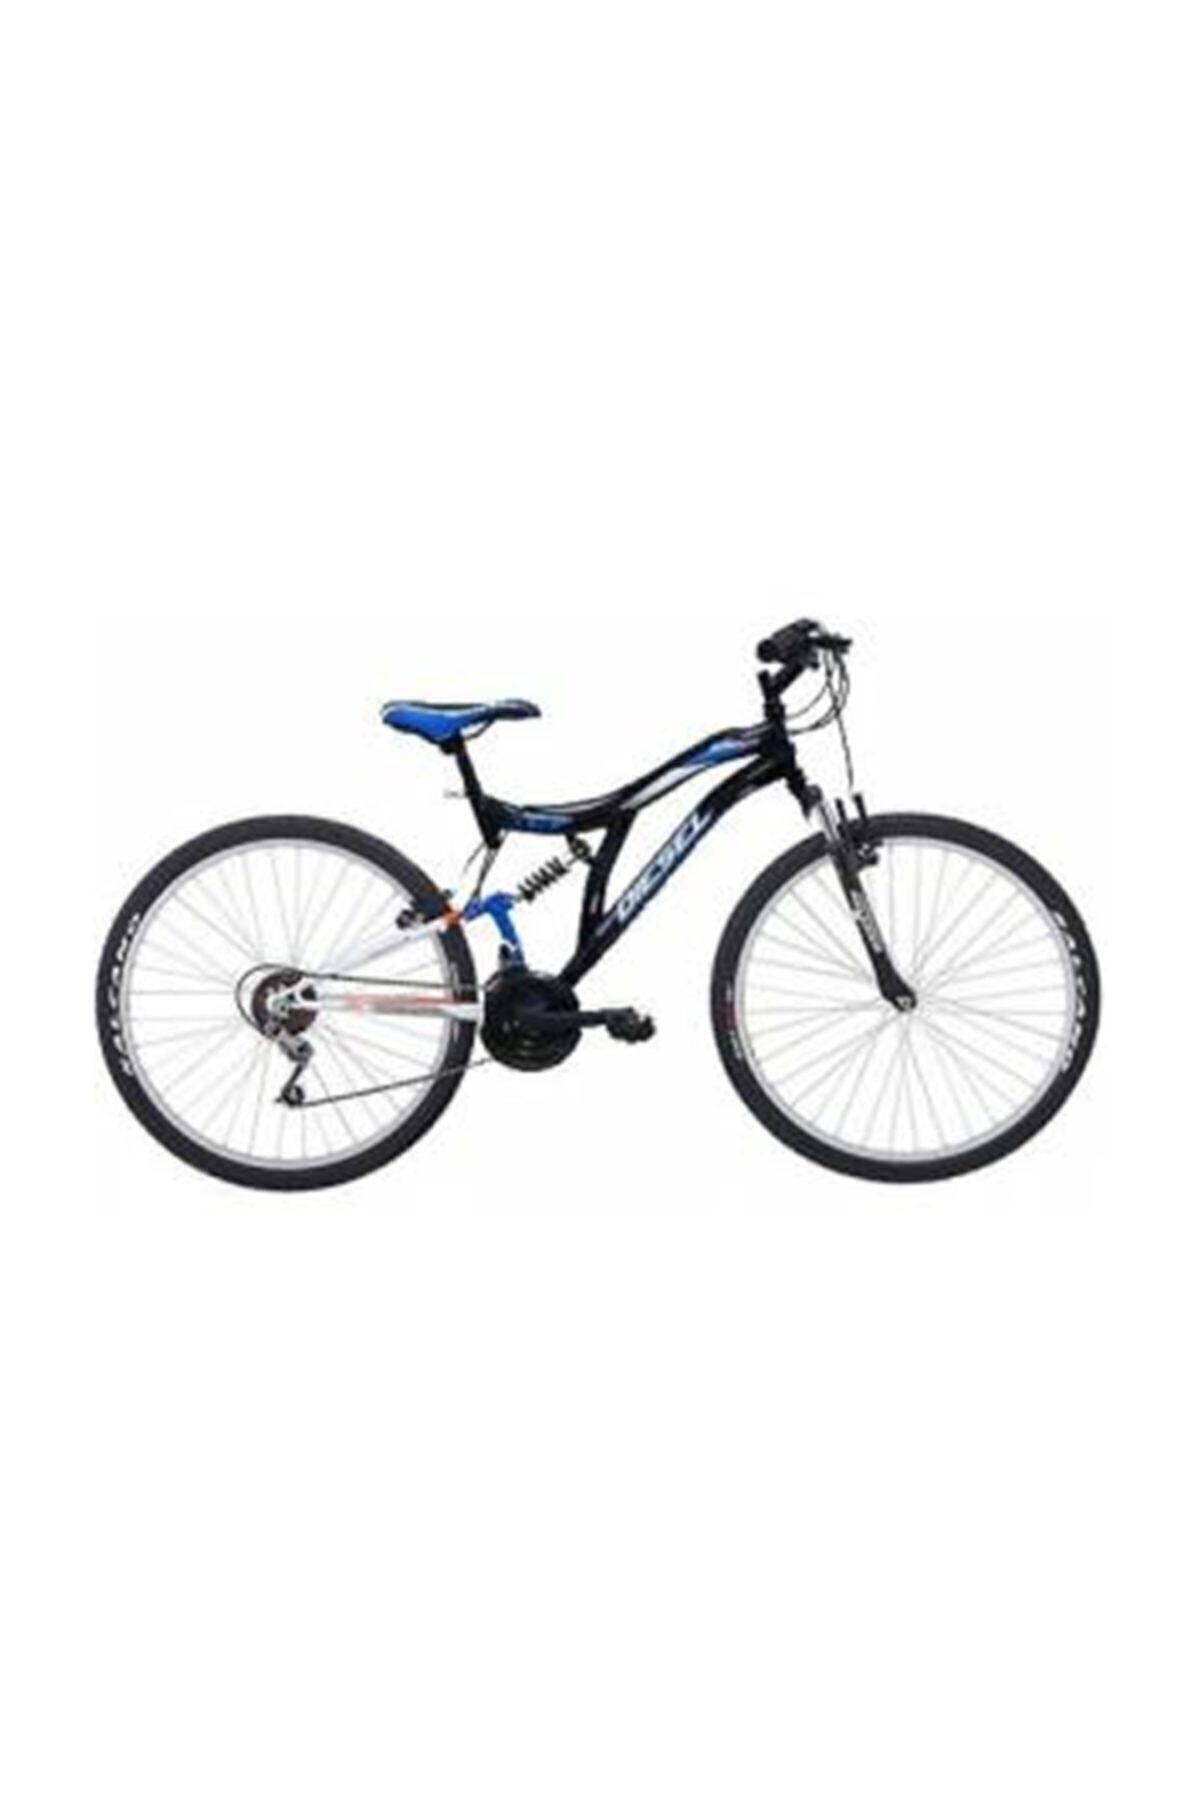 DİESELBİKE Dıesel 26 Jant Bisiklet Çift Amortisörlü 21 Vites Dağ Bisikleti 1